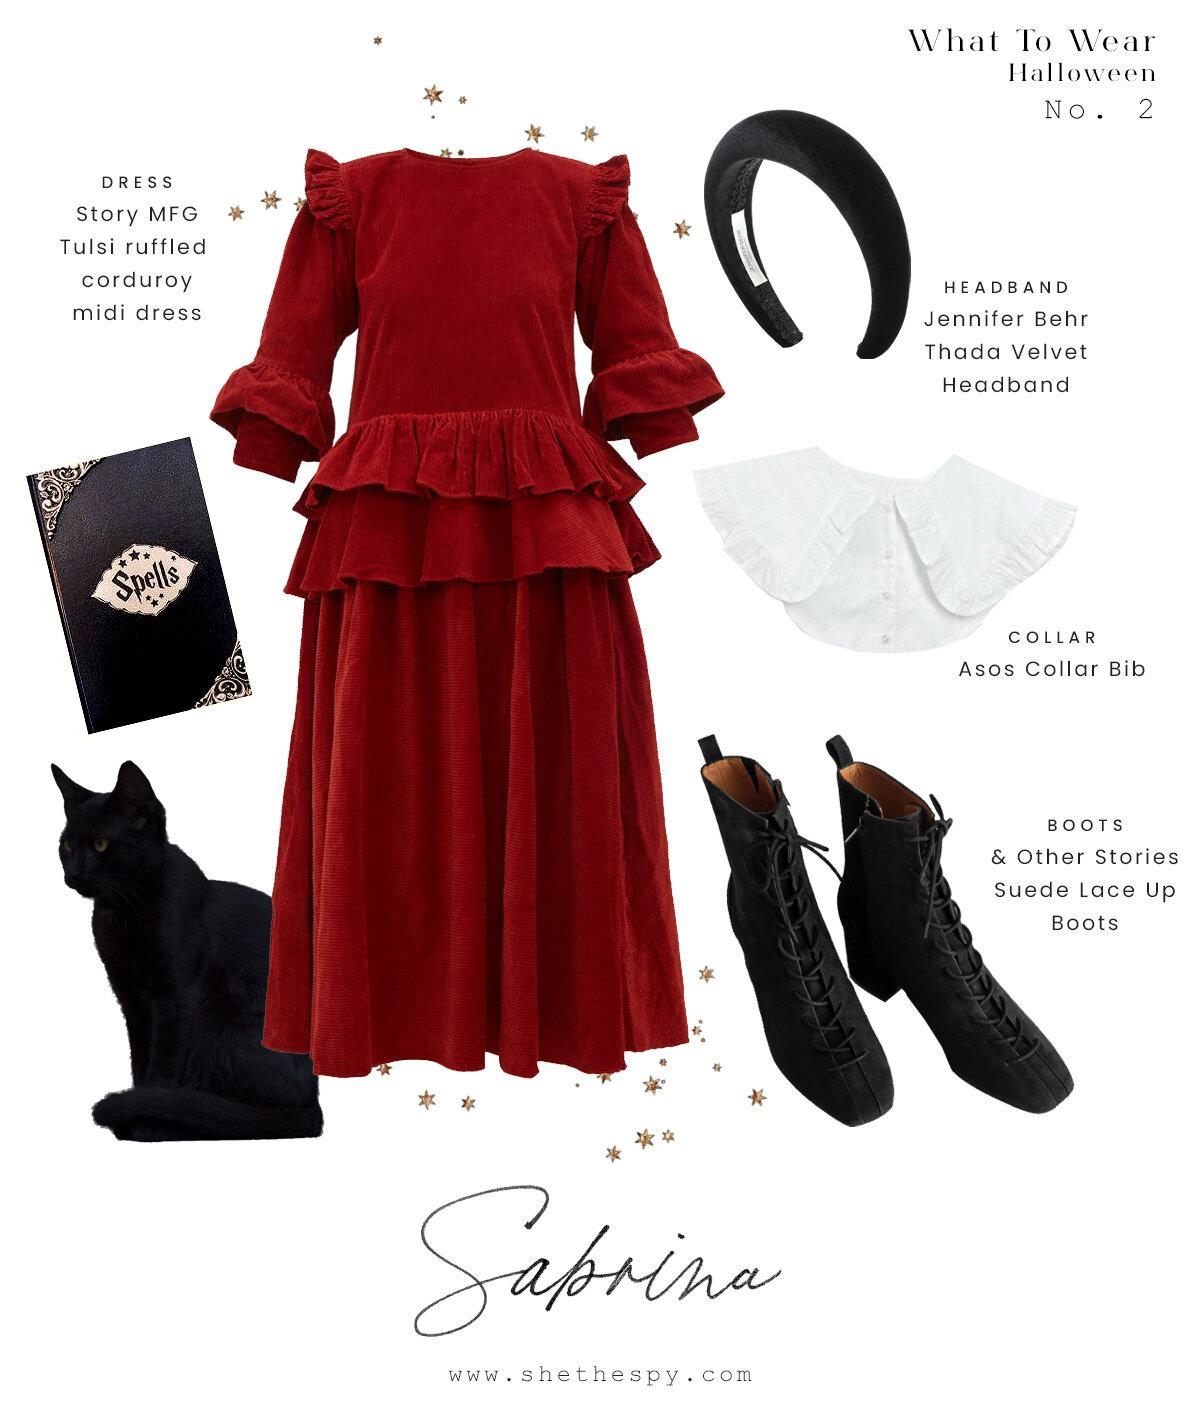 shethespy-halloween-outfit-Sabrina.jpg